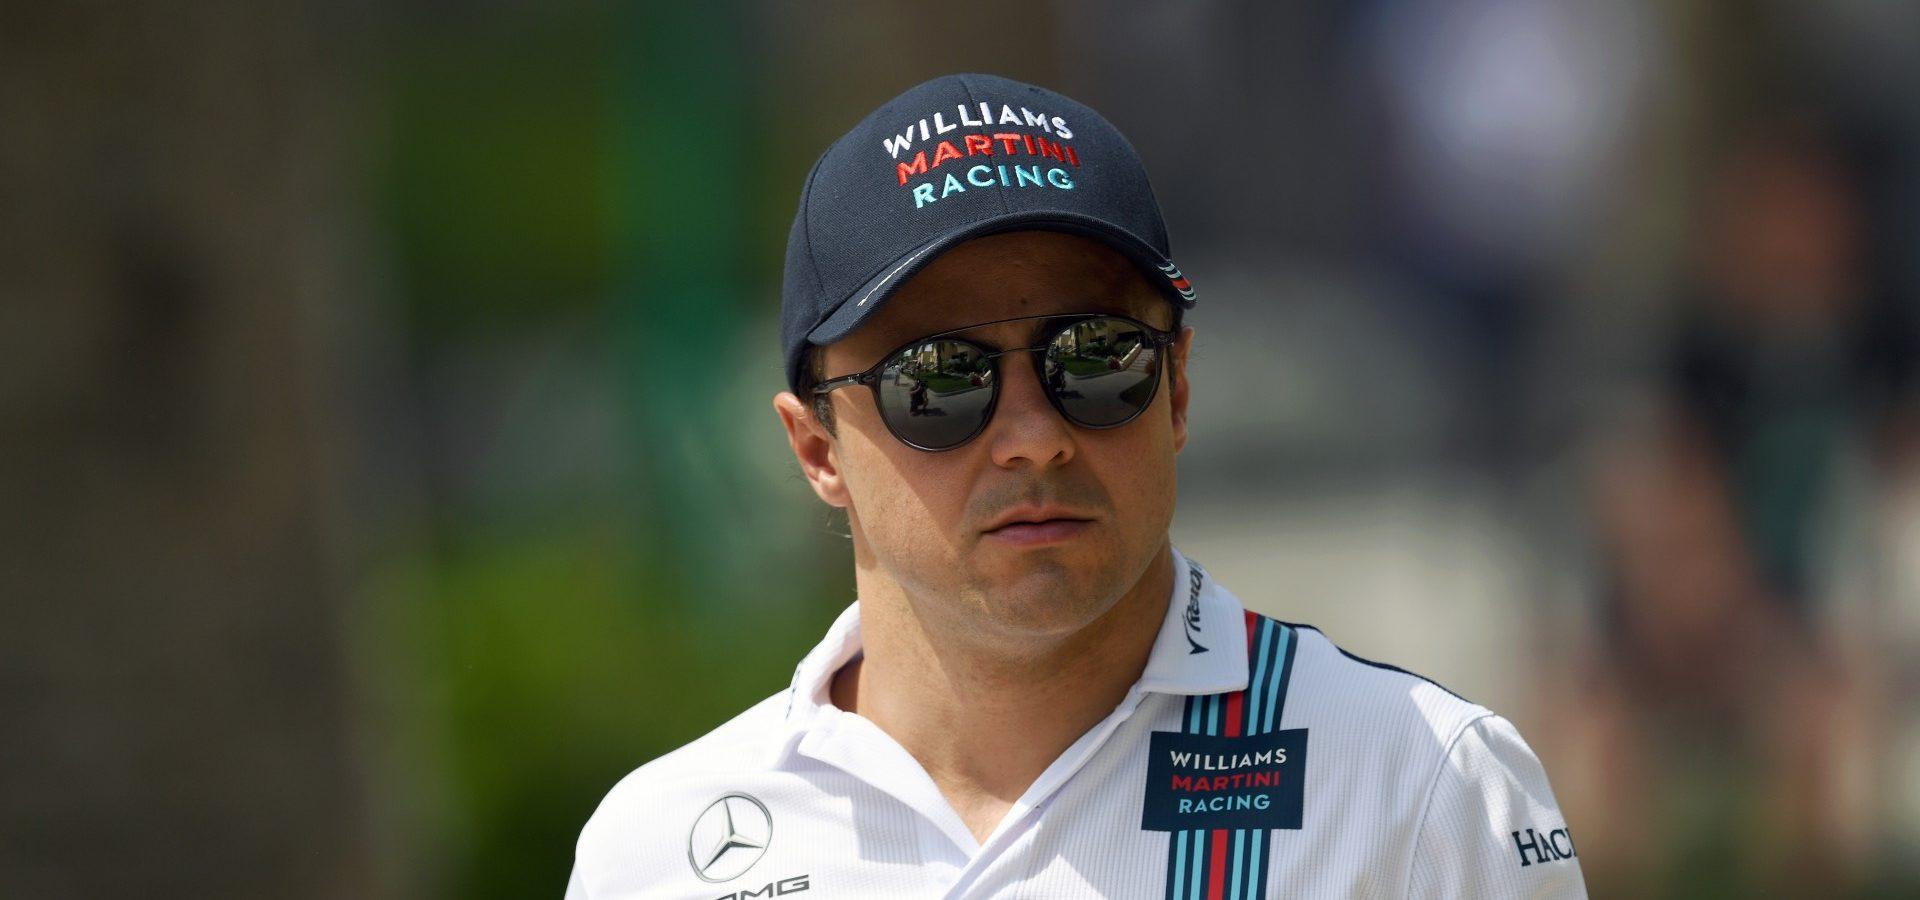 Bahrain Grand Prix Qualifying